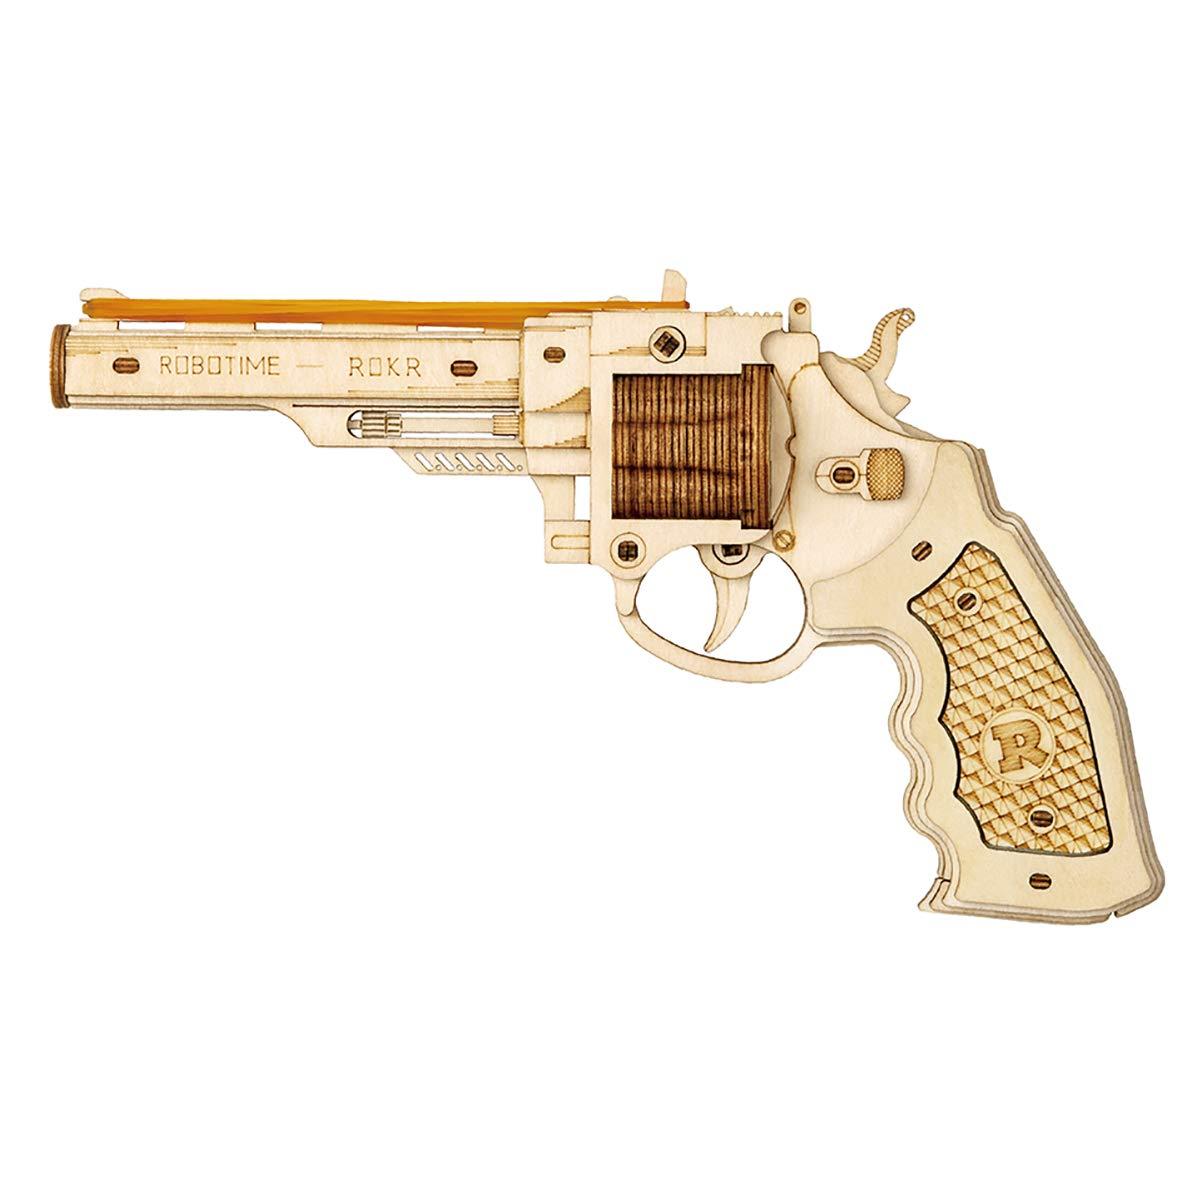 RoWood 3D Wooden Puzzle Toy Gun Model Kit, Rubber Band Gun Gift for Kids & Teens Boys Girls - Corsac M60